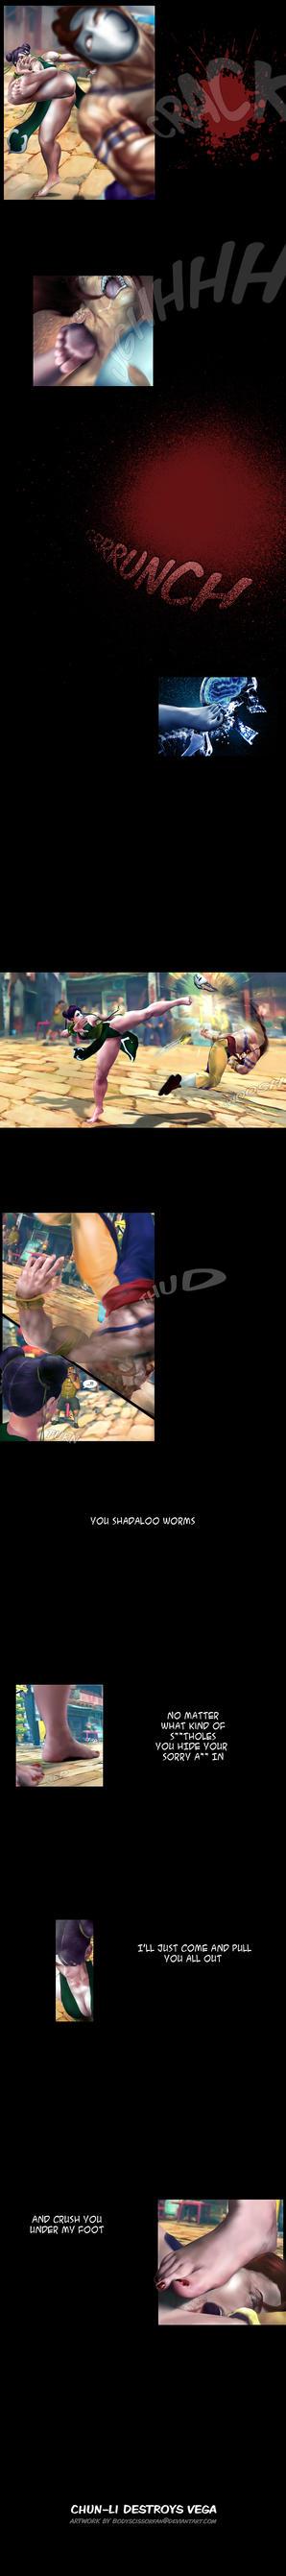 Chun-Li destroys Vega by bodyscissorfan